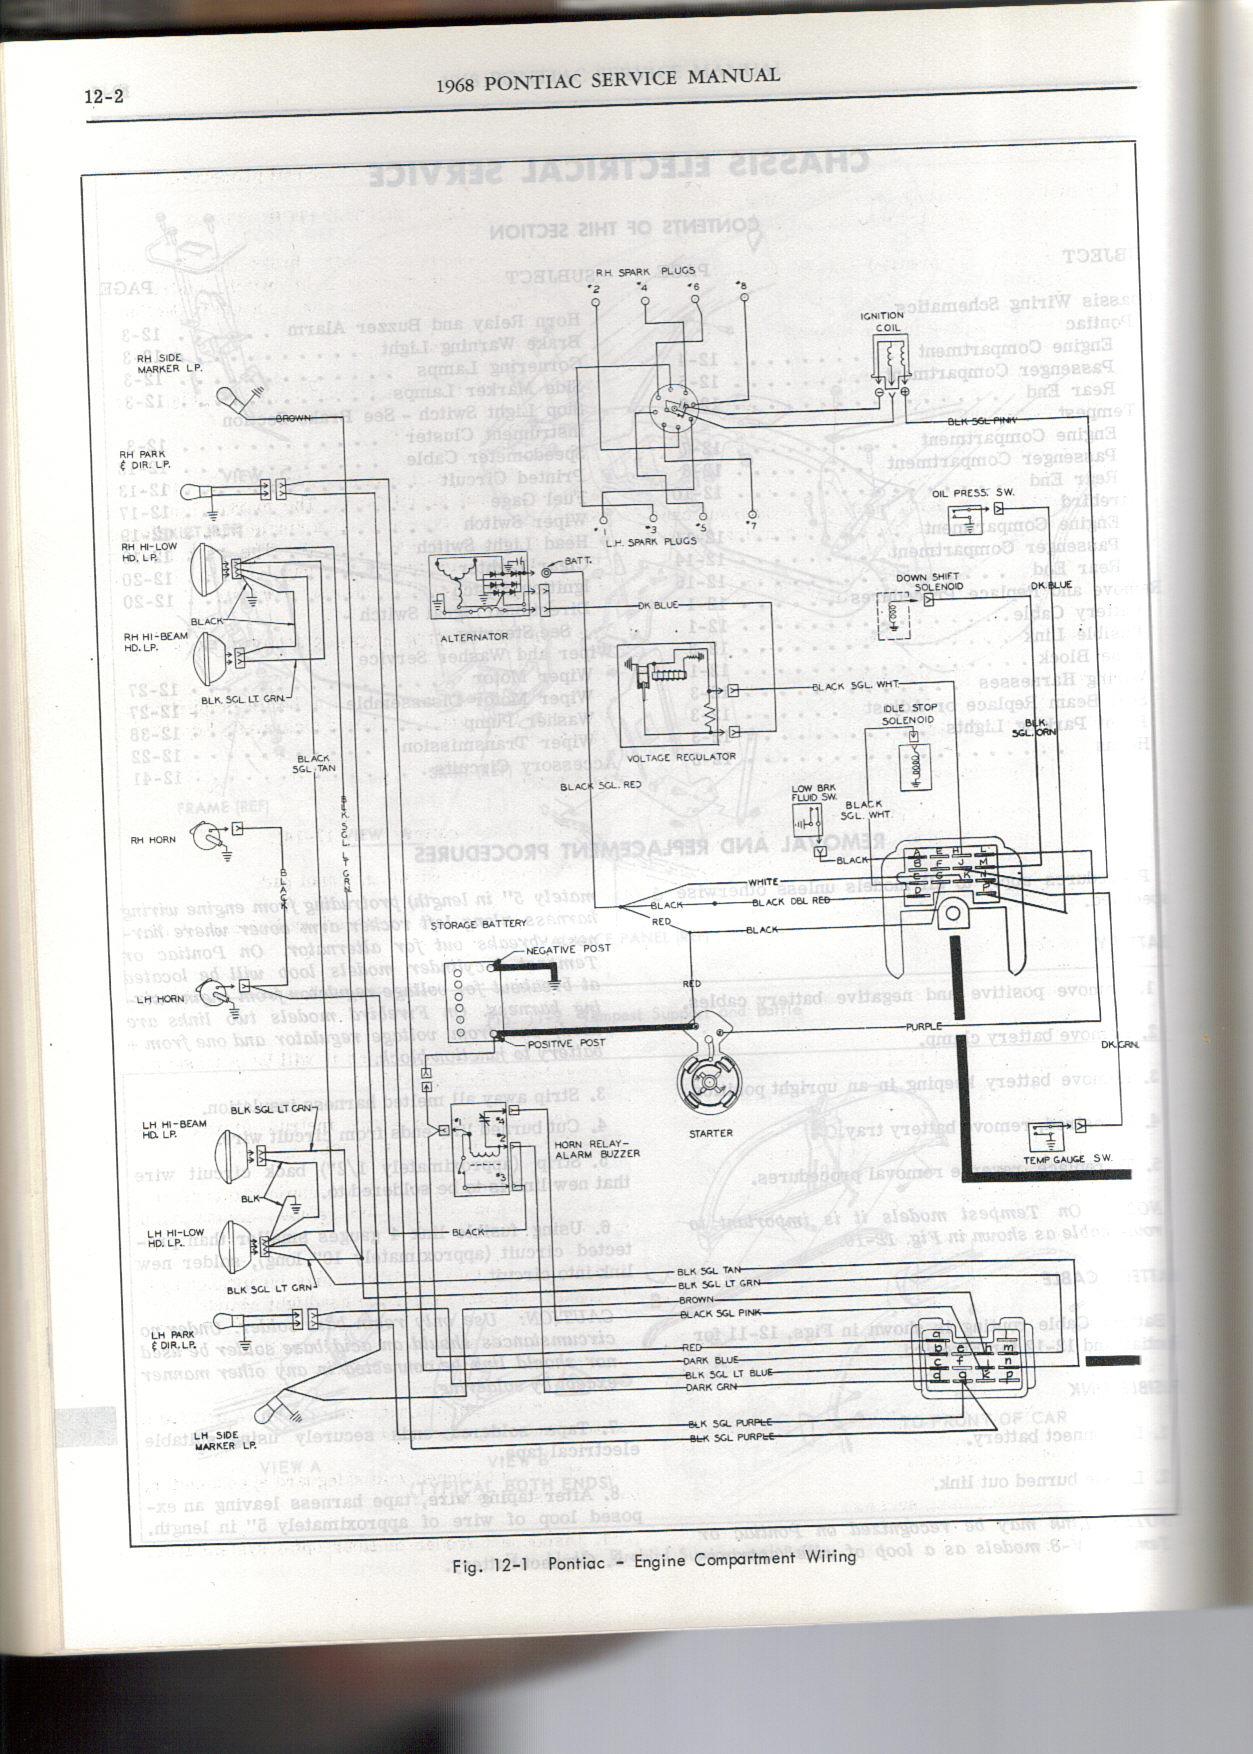 alternator wiring diagram pontiac alternator image pontiac 400 distributor wire diagram ih h wiring diagram harley on alternator wiring diagram pontiac